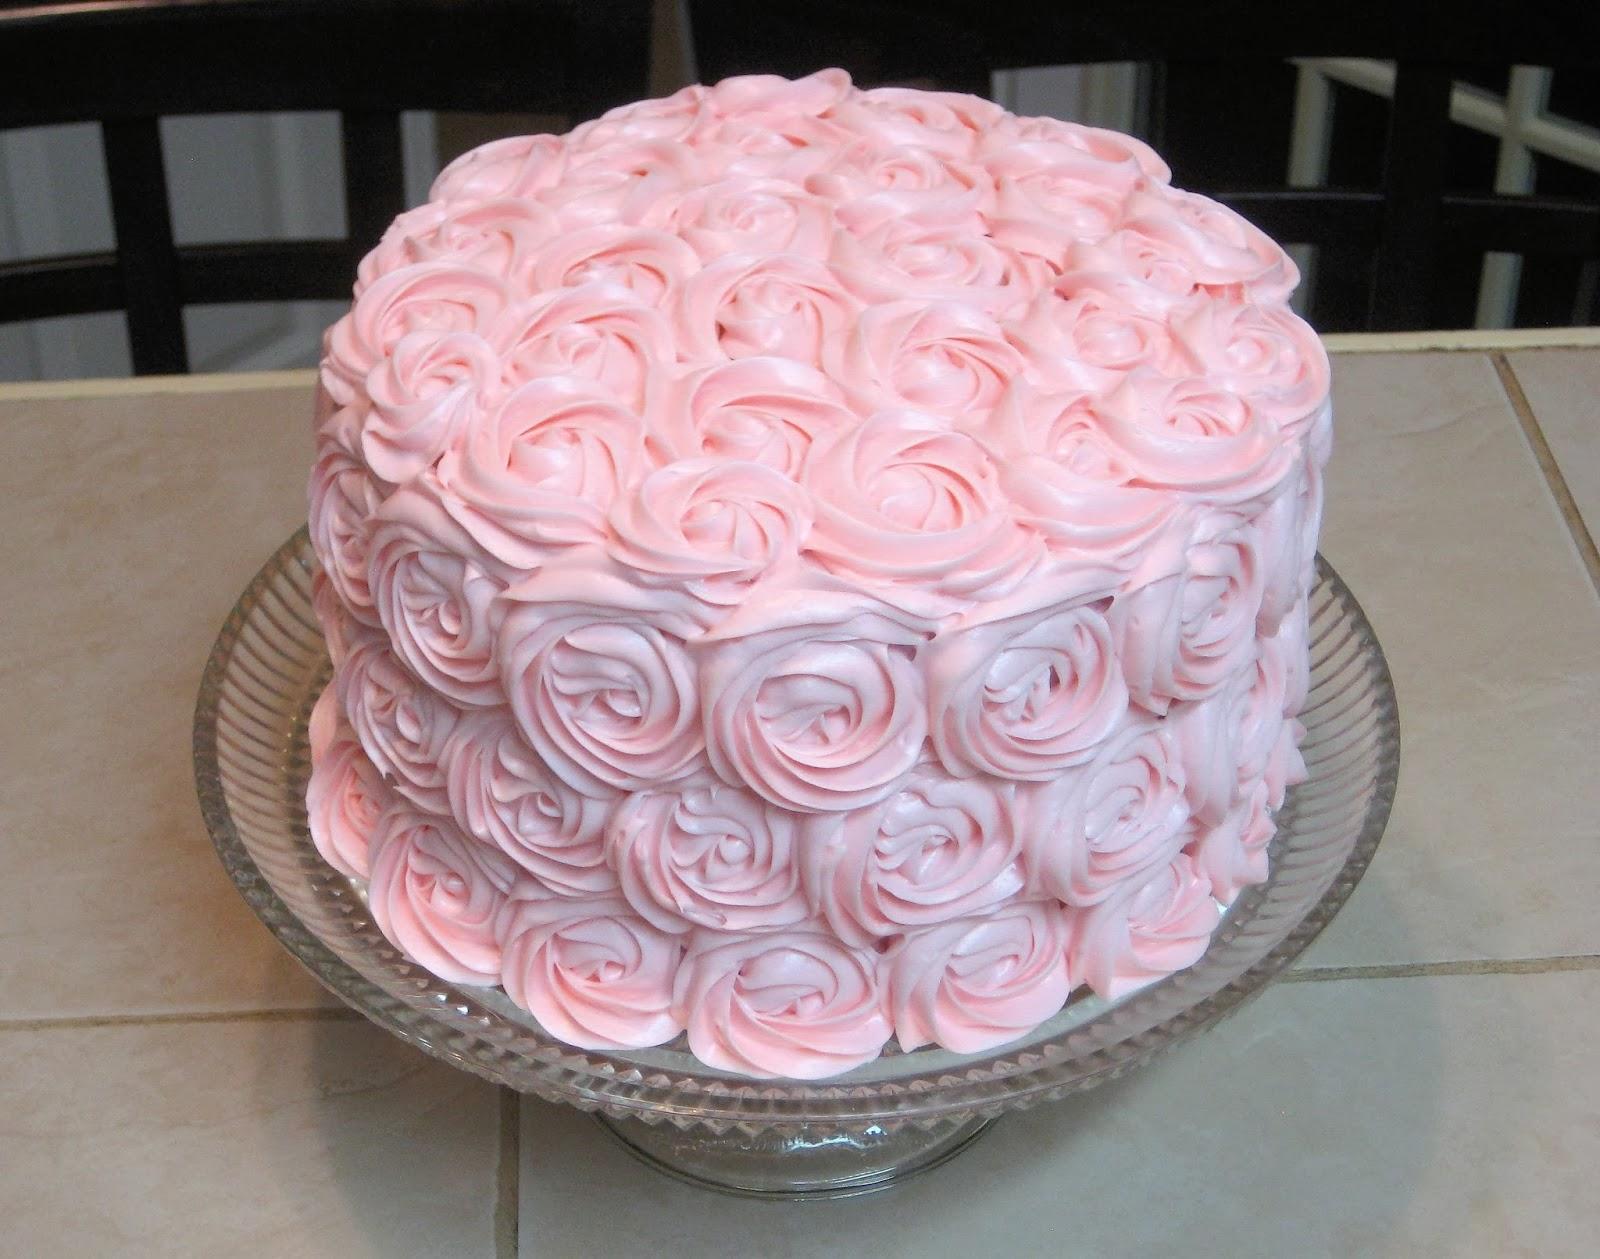 Pink Rose Cake Decorations